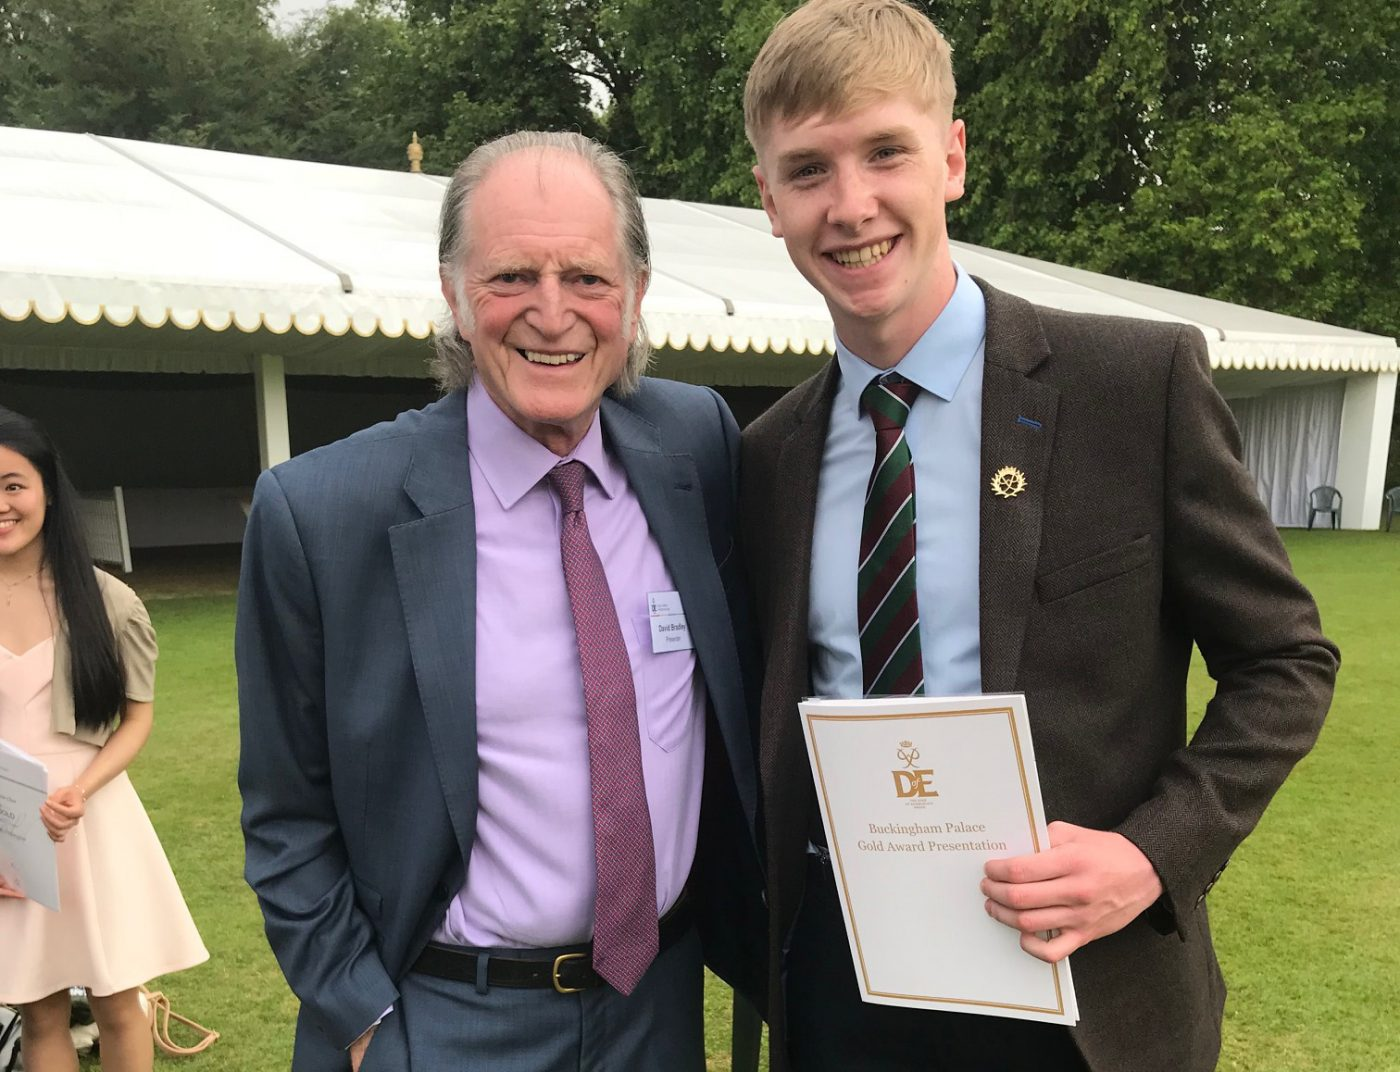 Former student receives DofE award at Buckingham Palace